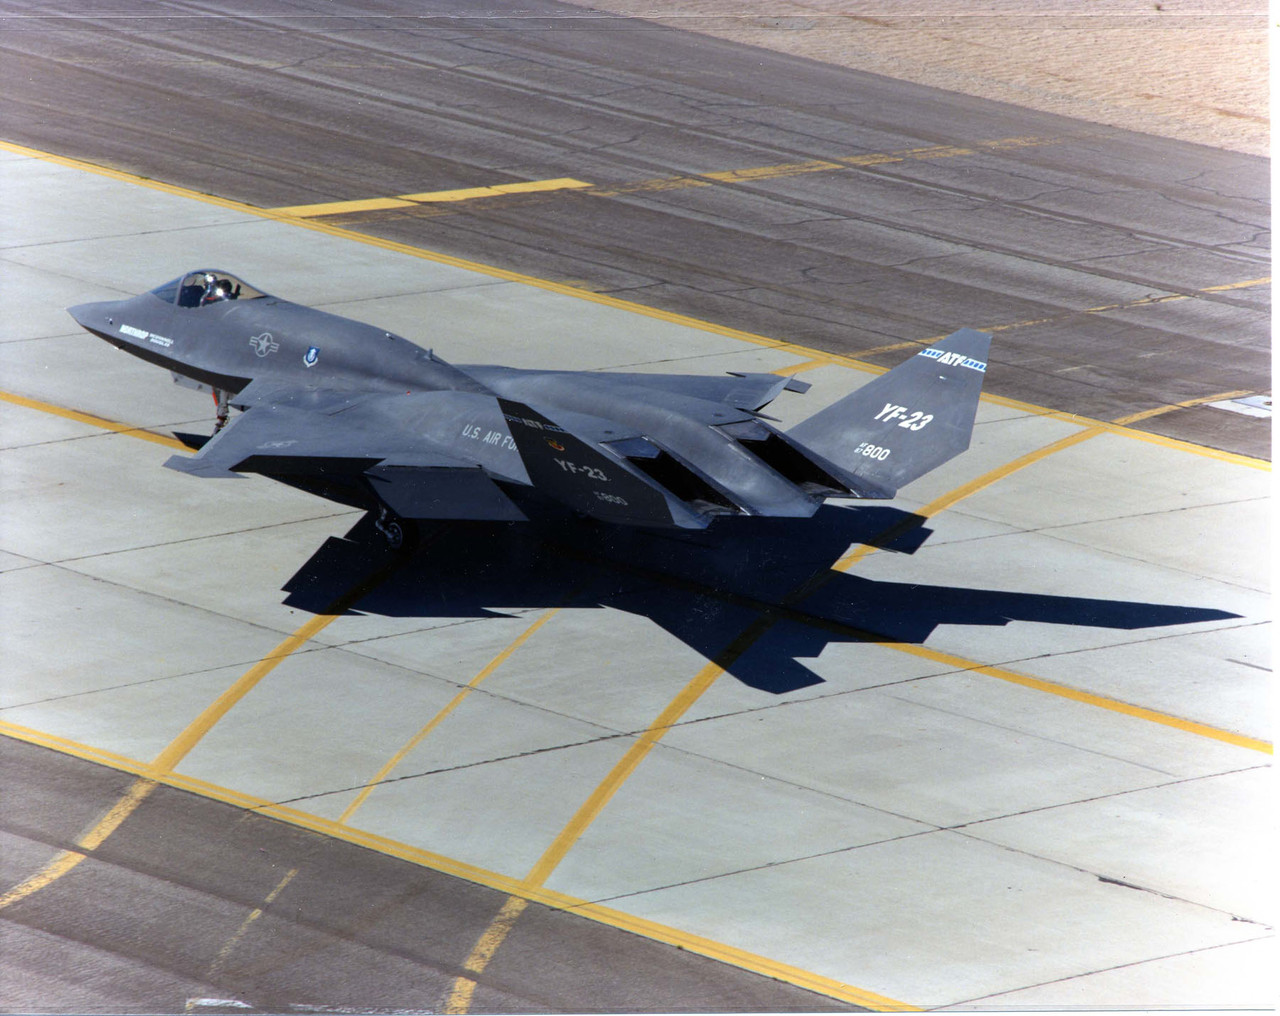 YF 23 (航空機)の画像 p1_18